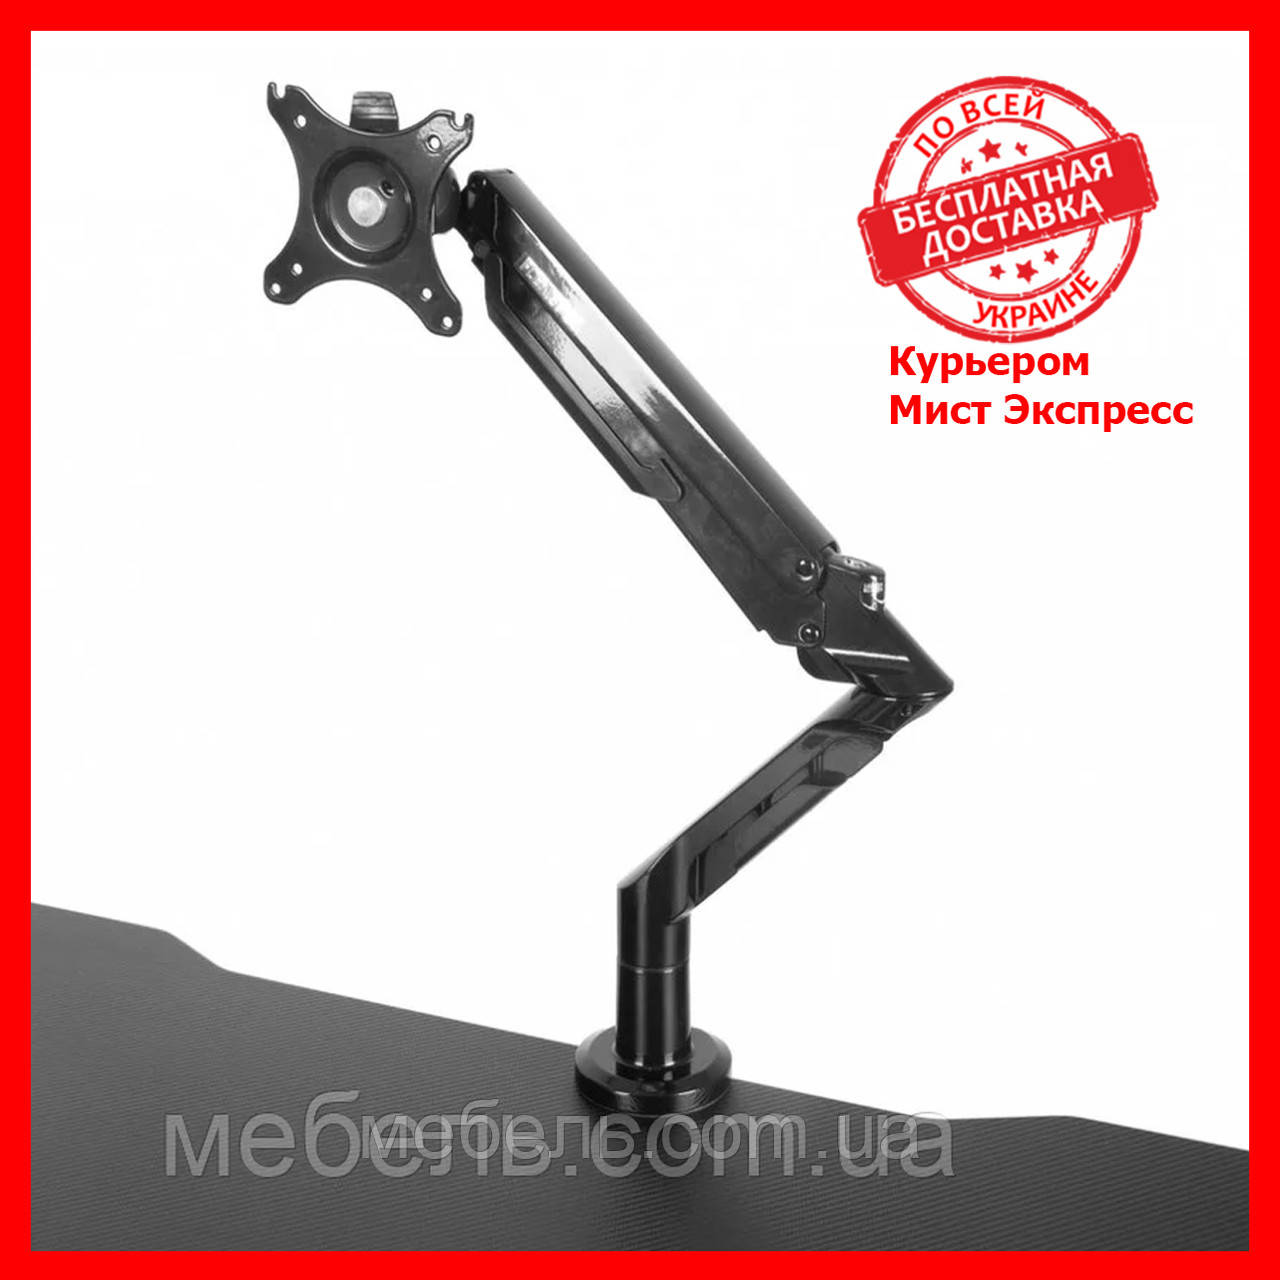 Кронштейн для монитора Barsky BF-01 Flexispot black, черный